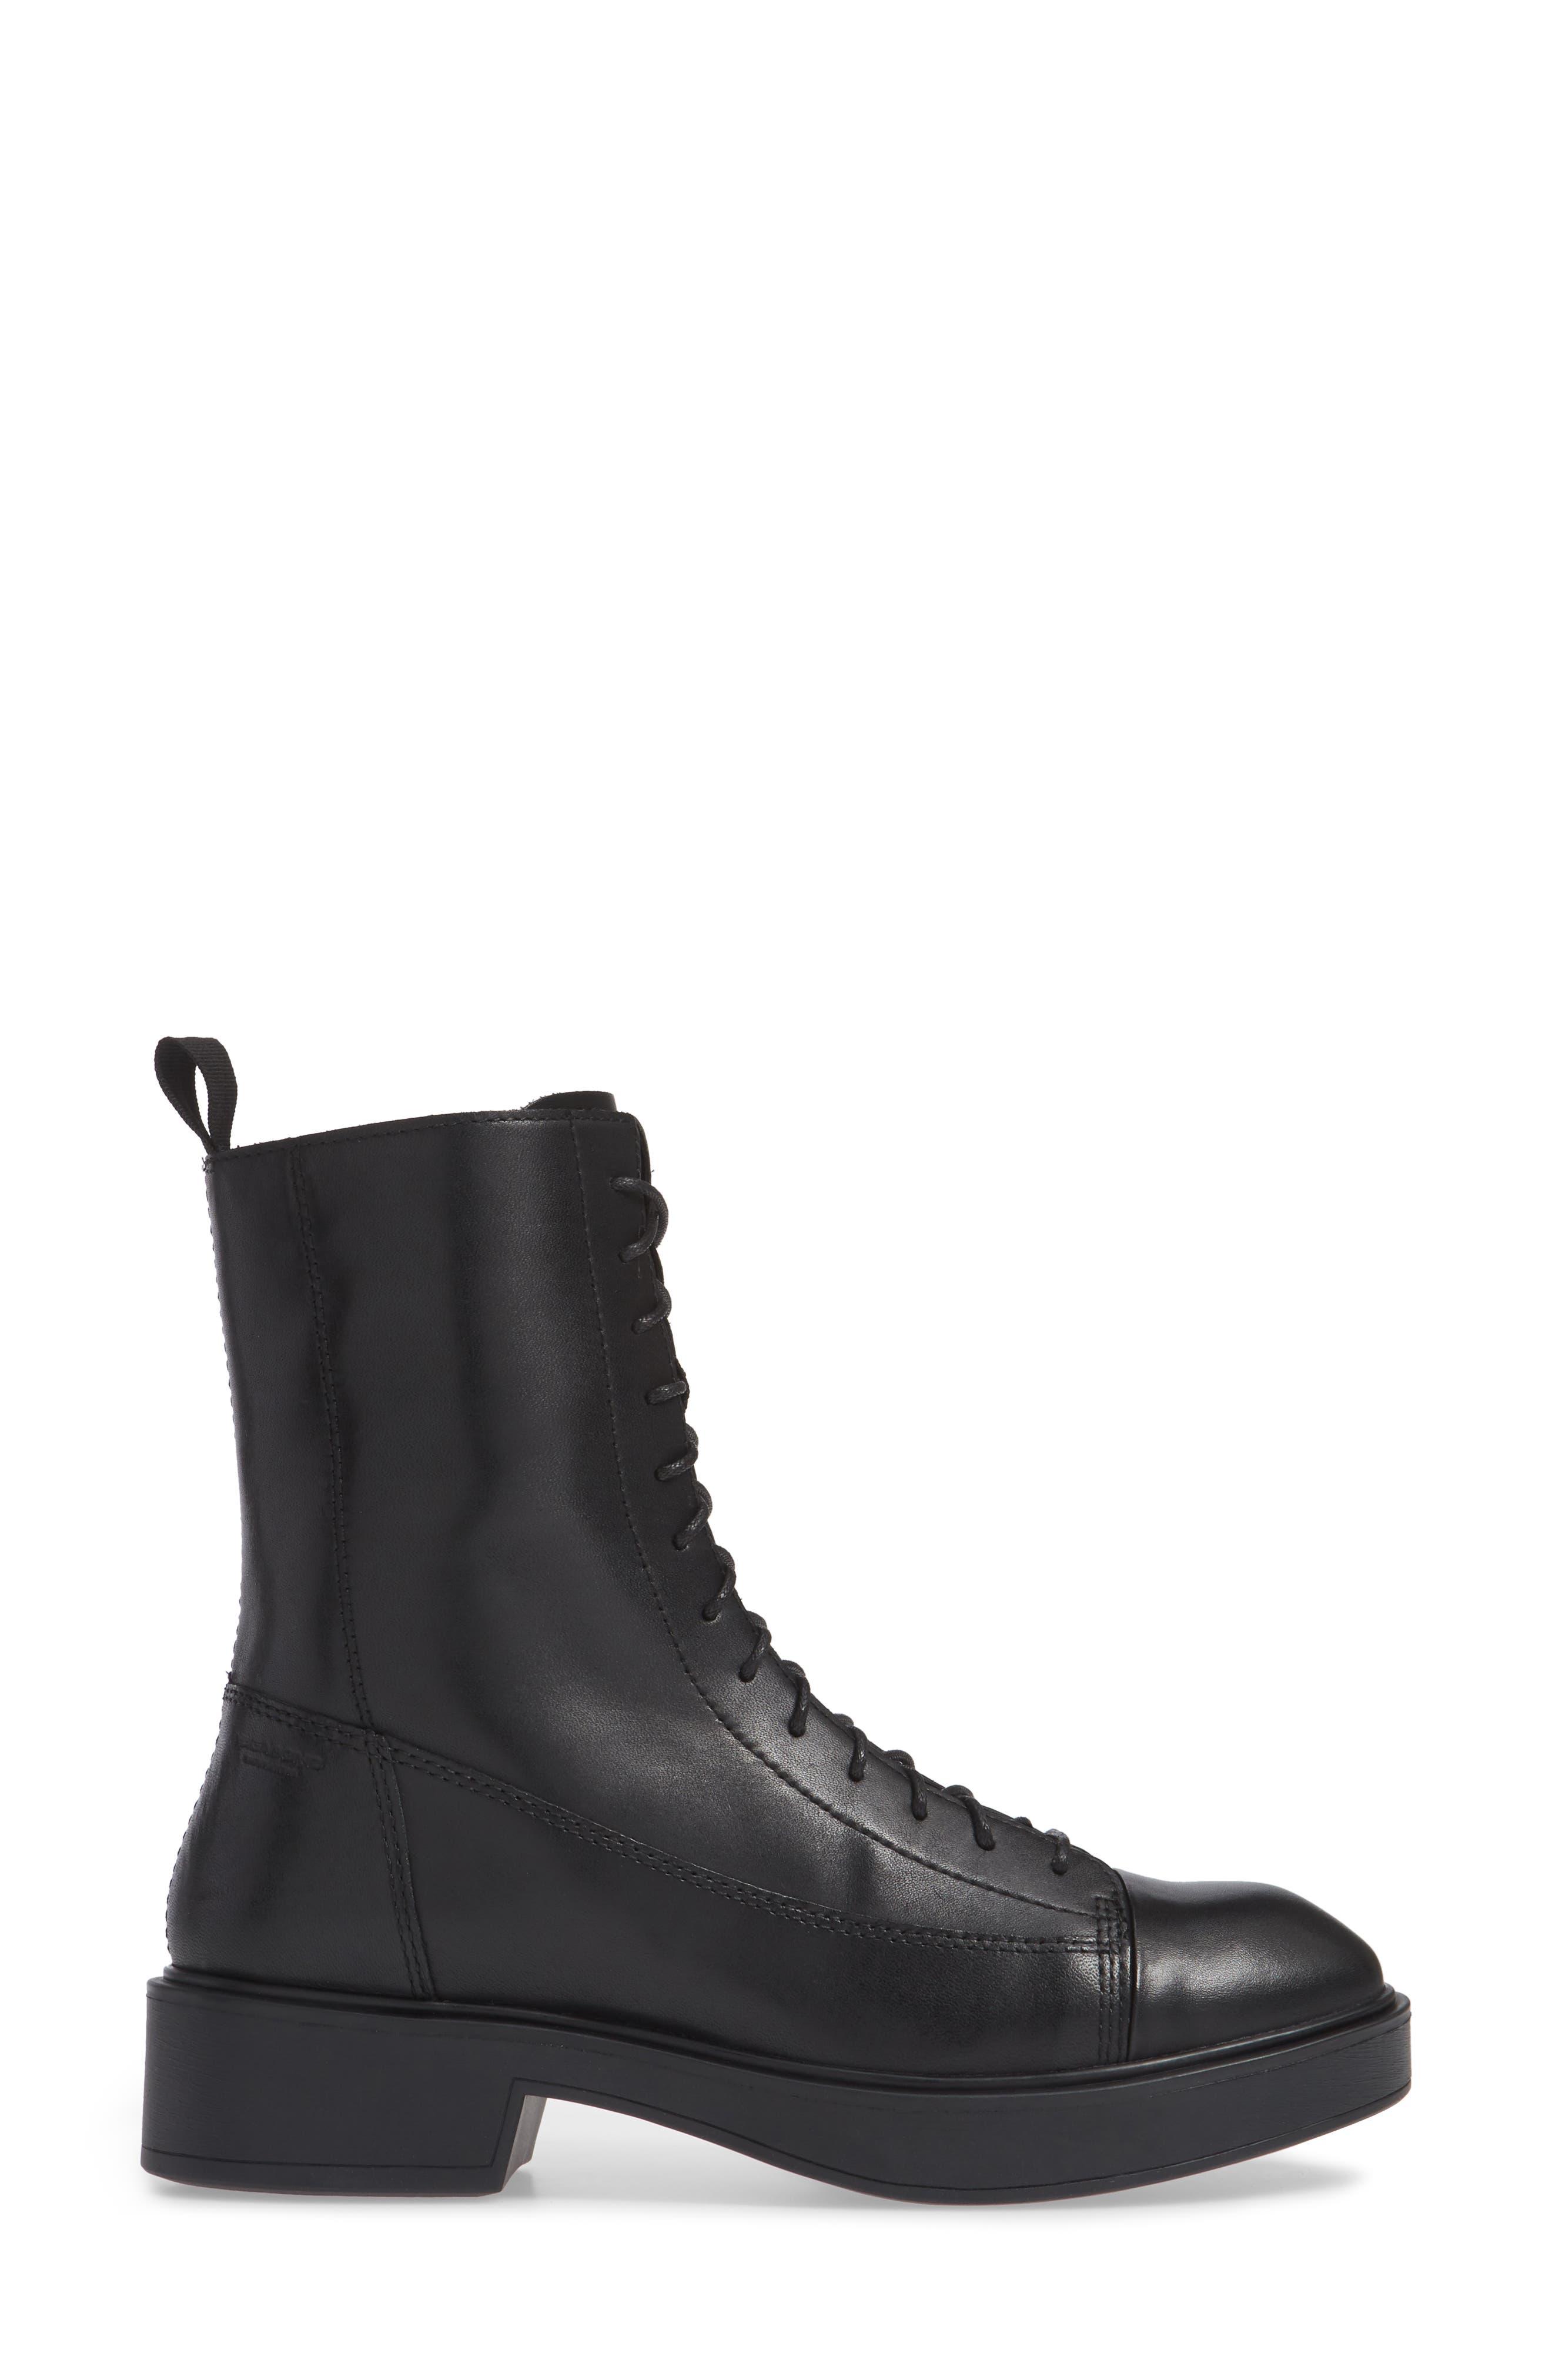 Shoemakers Diane Lace-Up Bootie,                             Alternate thumbnail 3, color,                             BLACK LEATHER